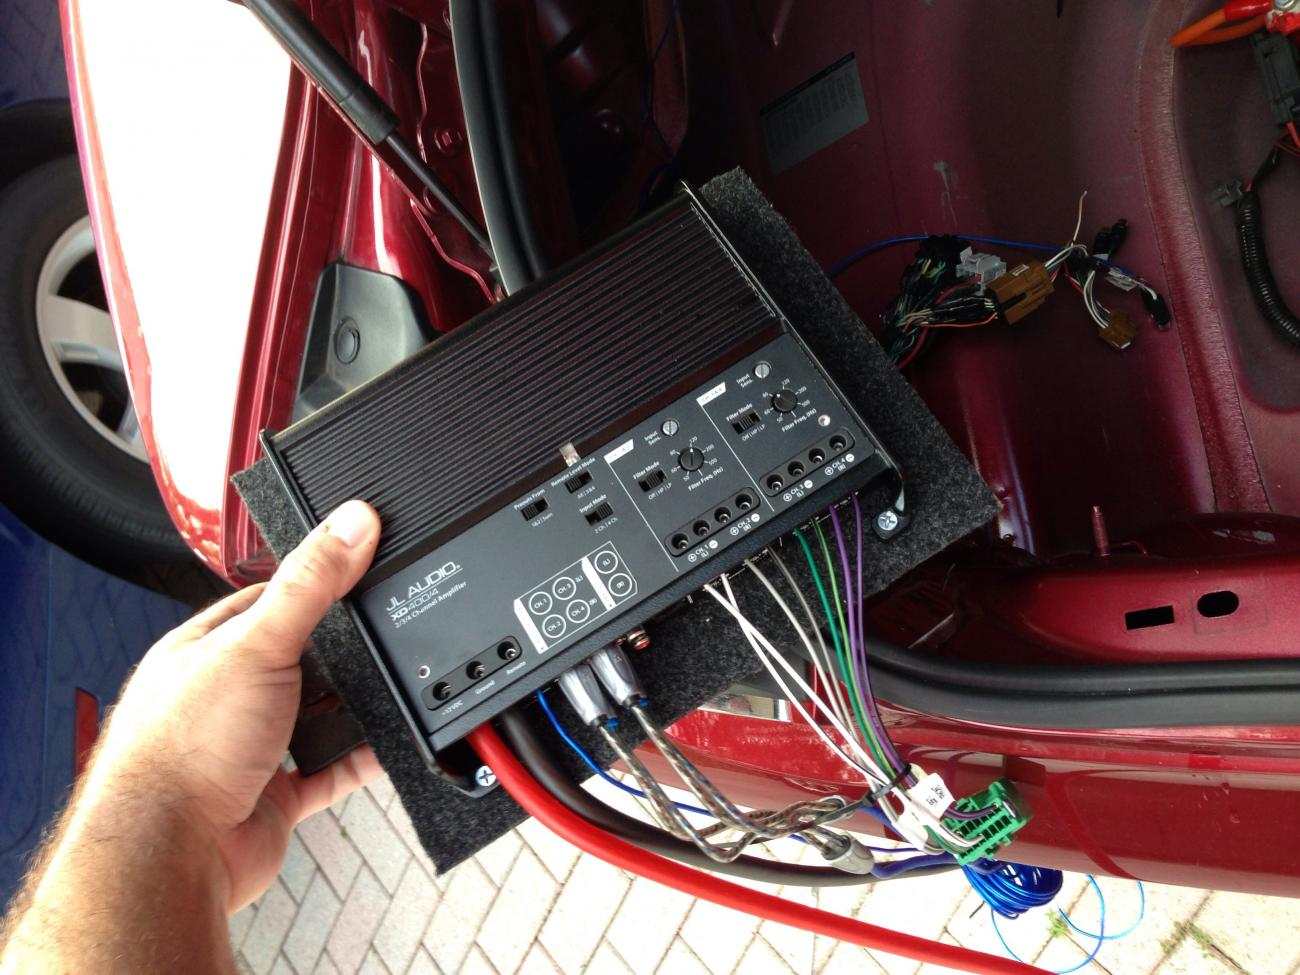 chevy bu radio wiring diagram images chevy traverse chevy camaro additionally 2013 impala radio wiring diagram